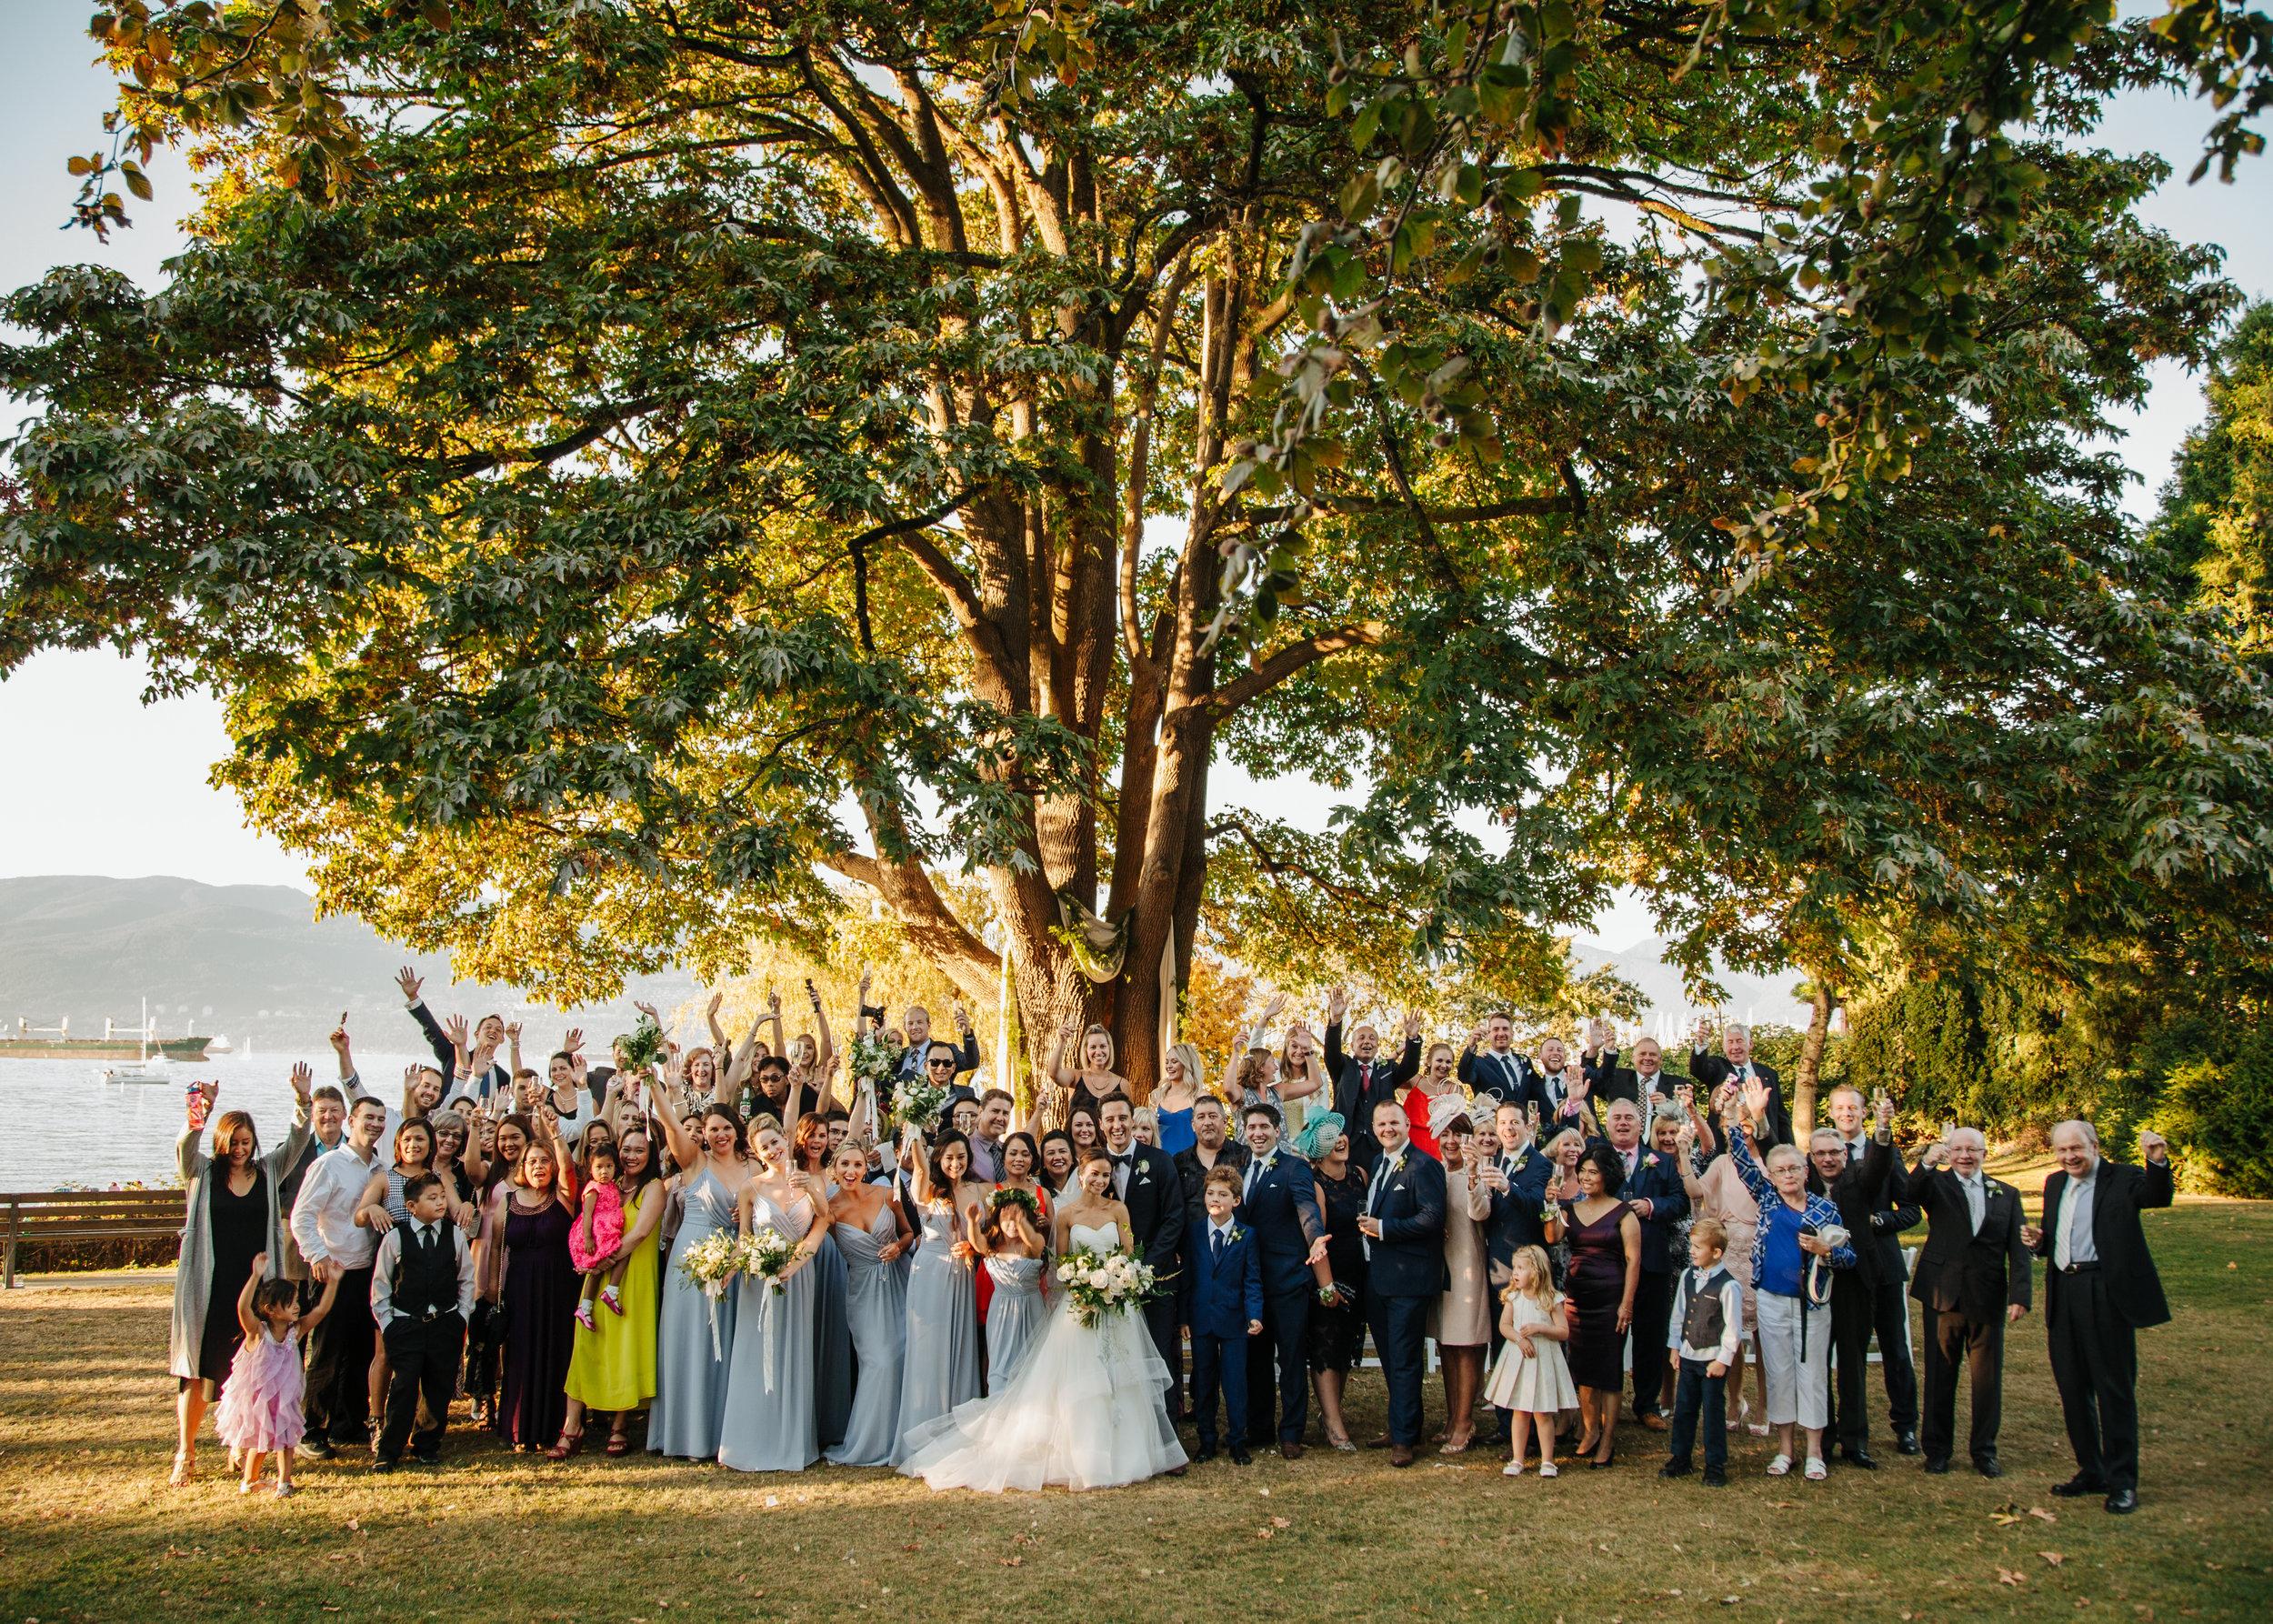 herafilms_carlotta_alex_wedding_hera_highres-54.jpg